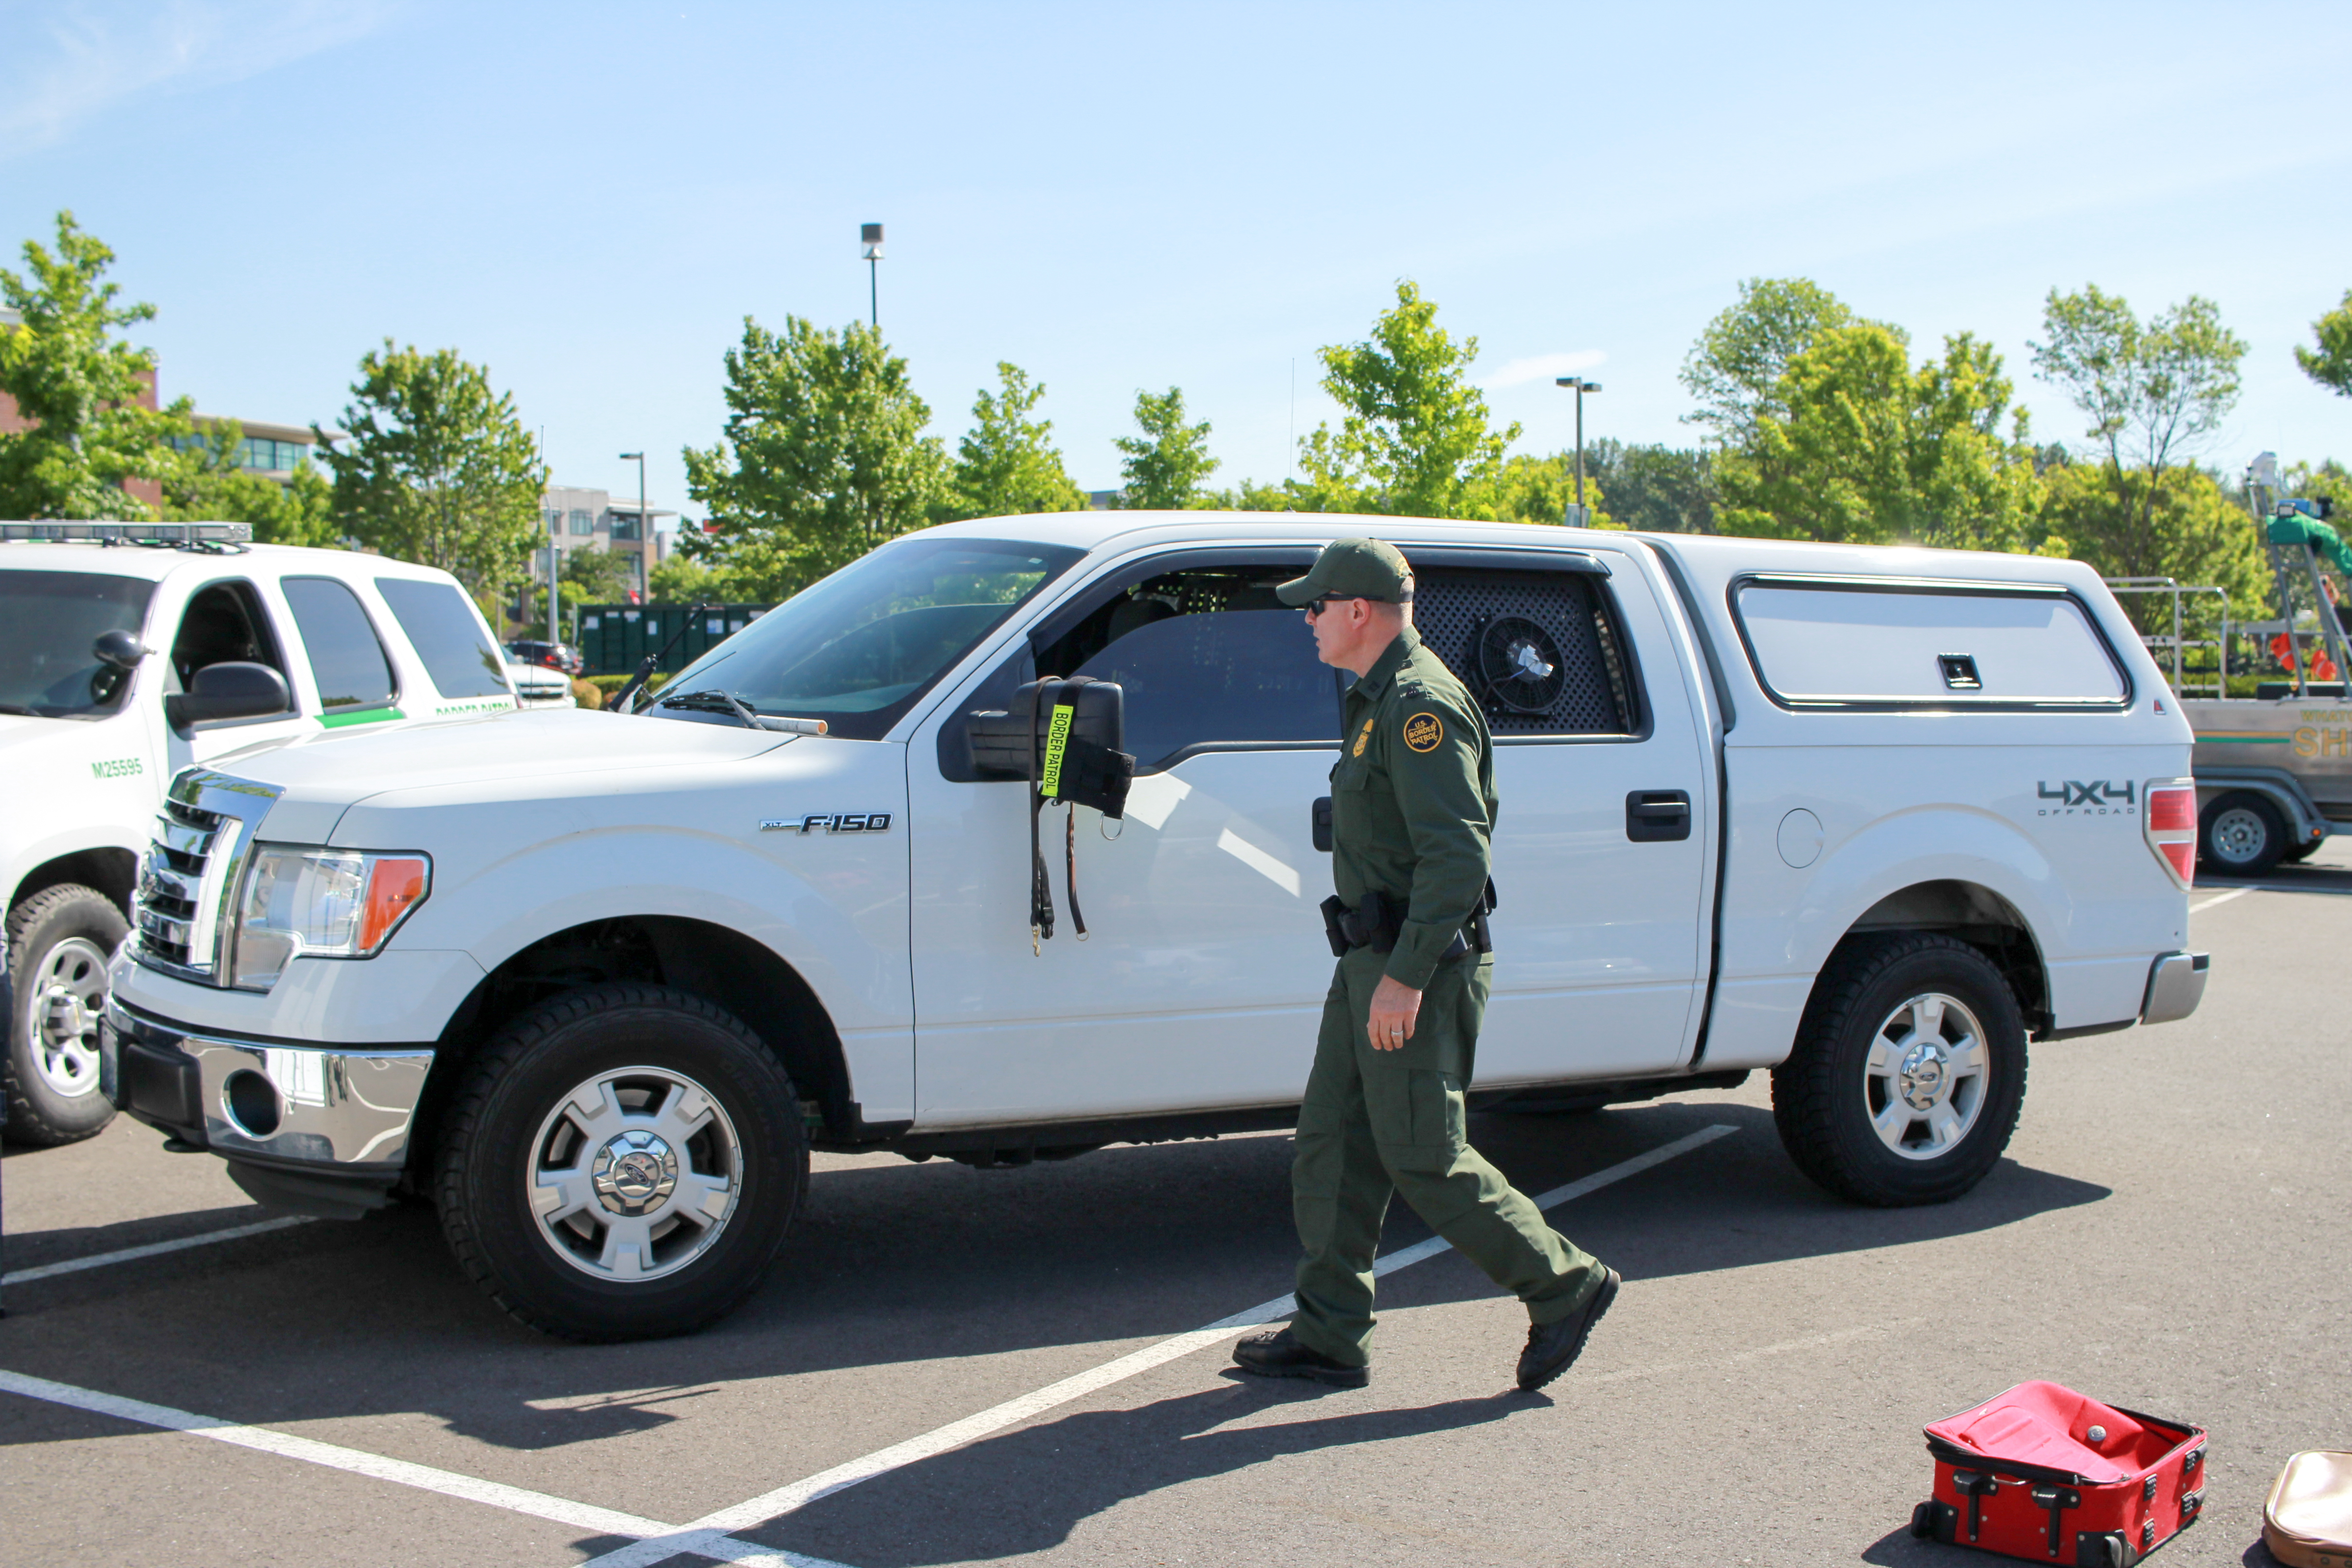 Border Patrol Unmarked K9 Unit, Blaine Sector, Border Patrol, Car, CBP, HQ Photo